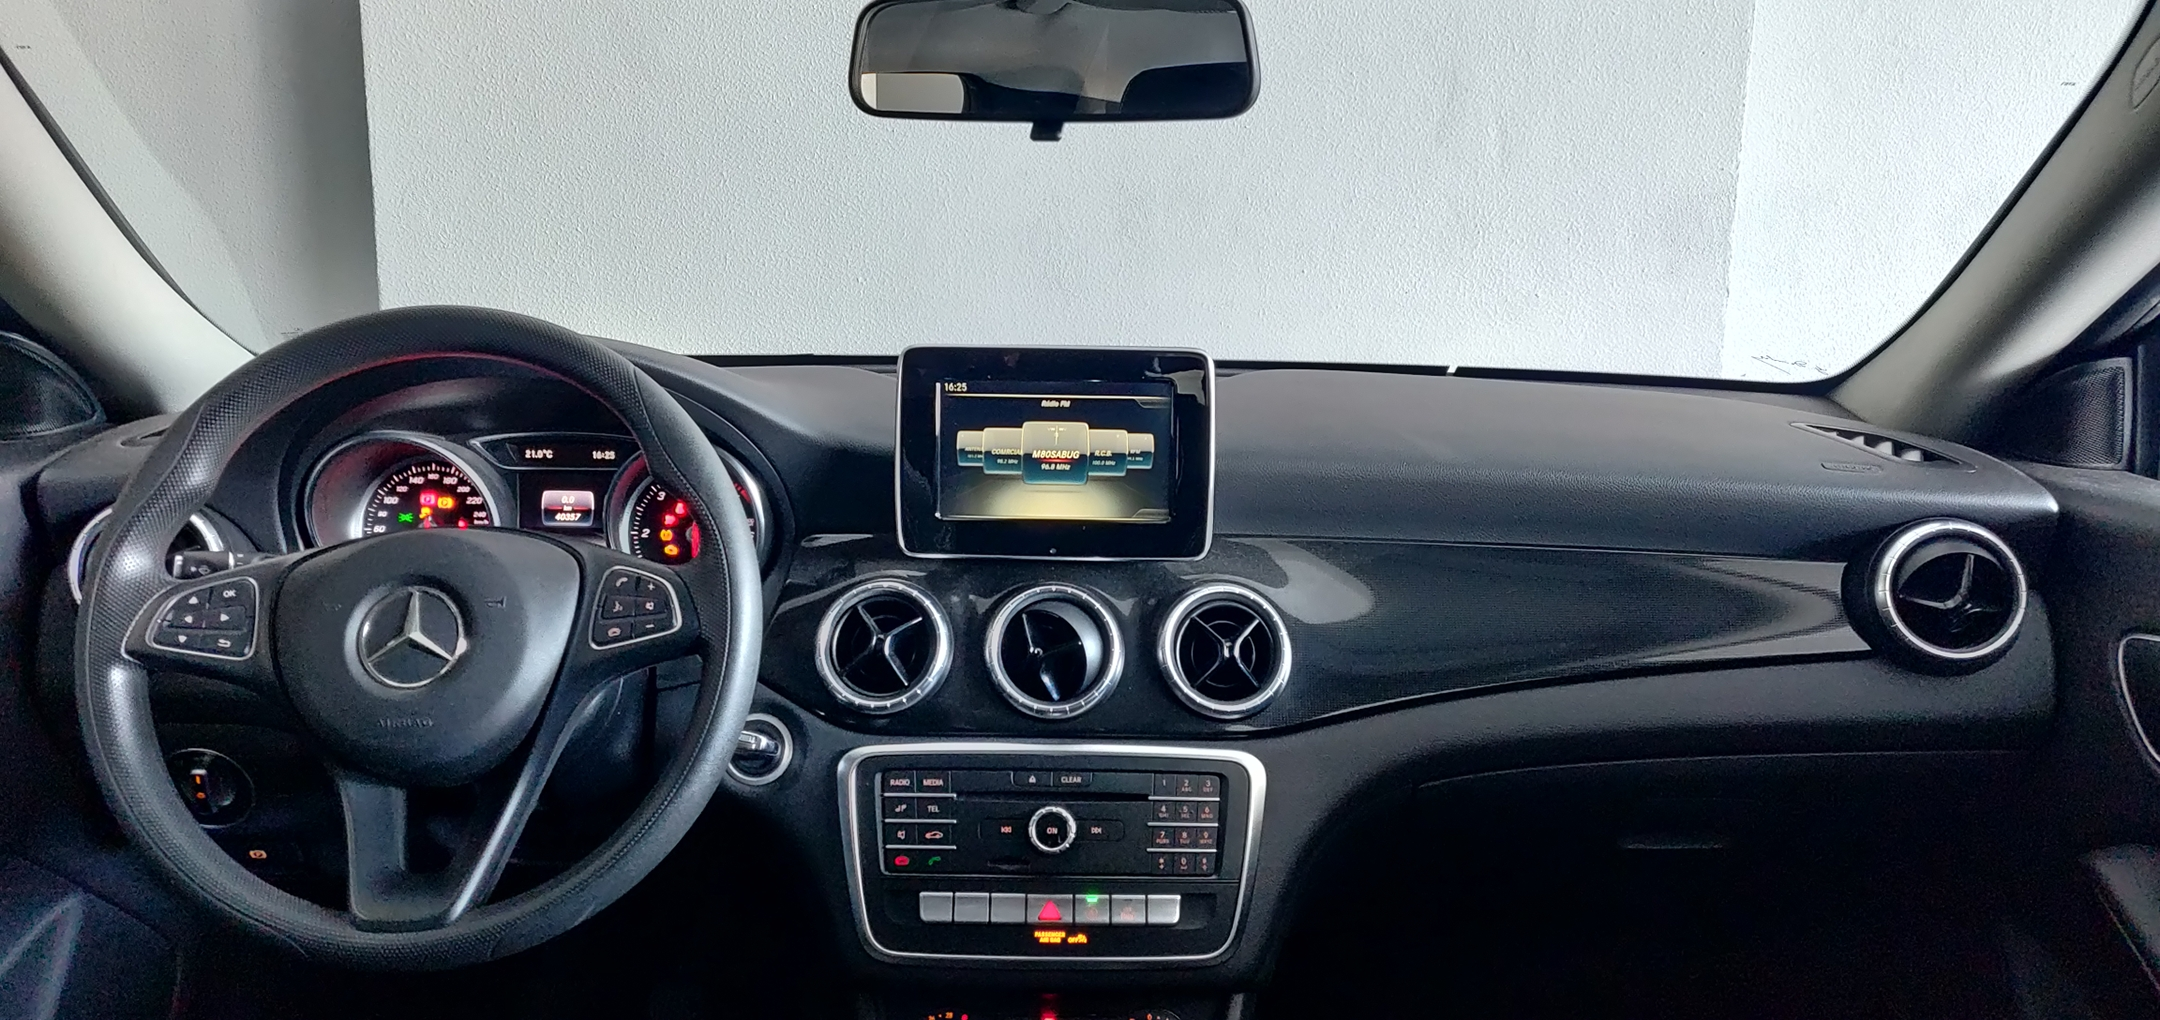 Mercedes-Benz CLA 180 1.5 Style | Imagem 10